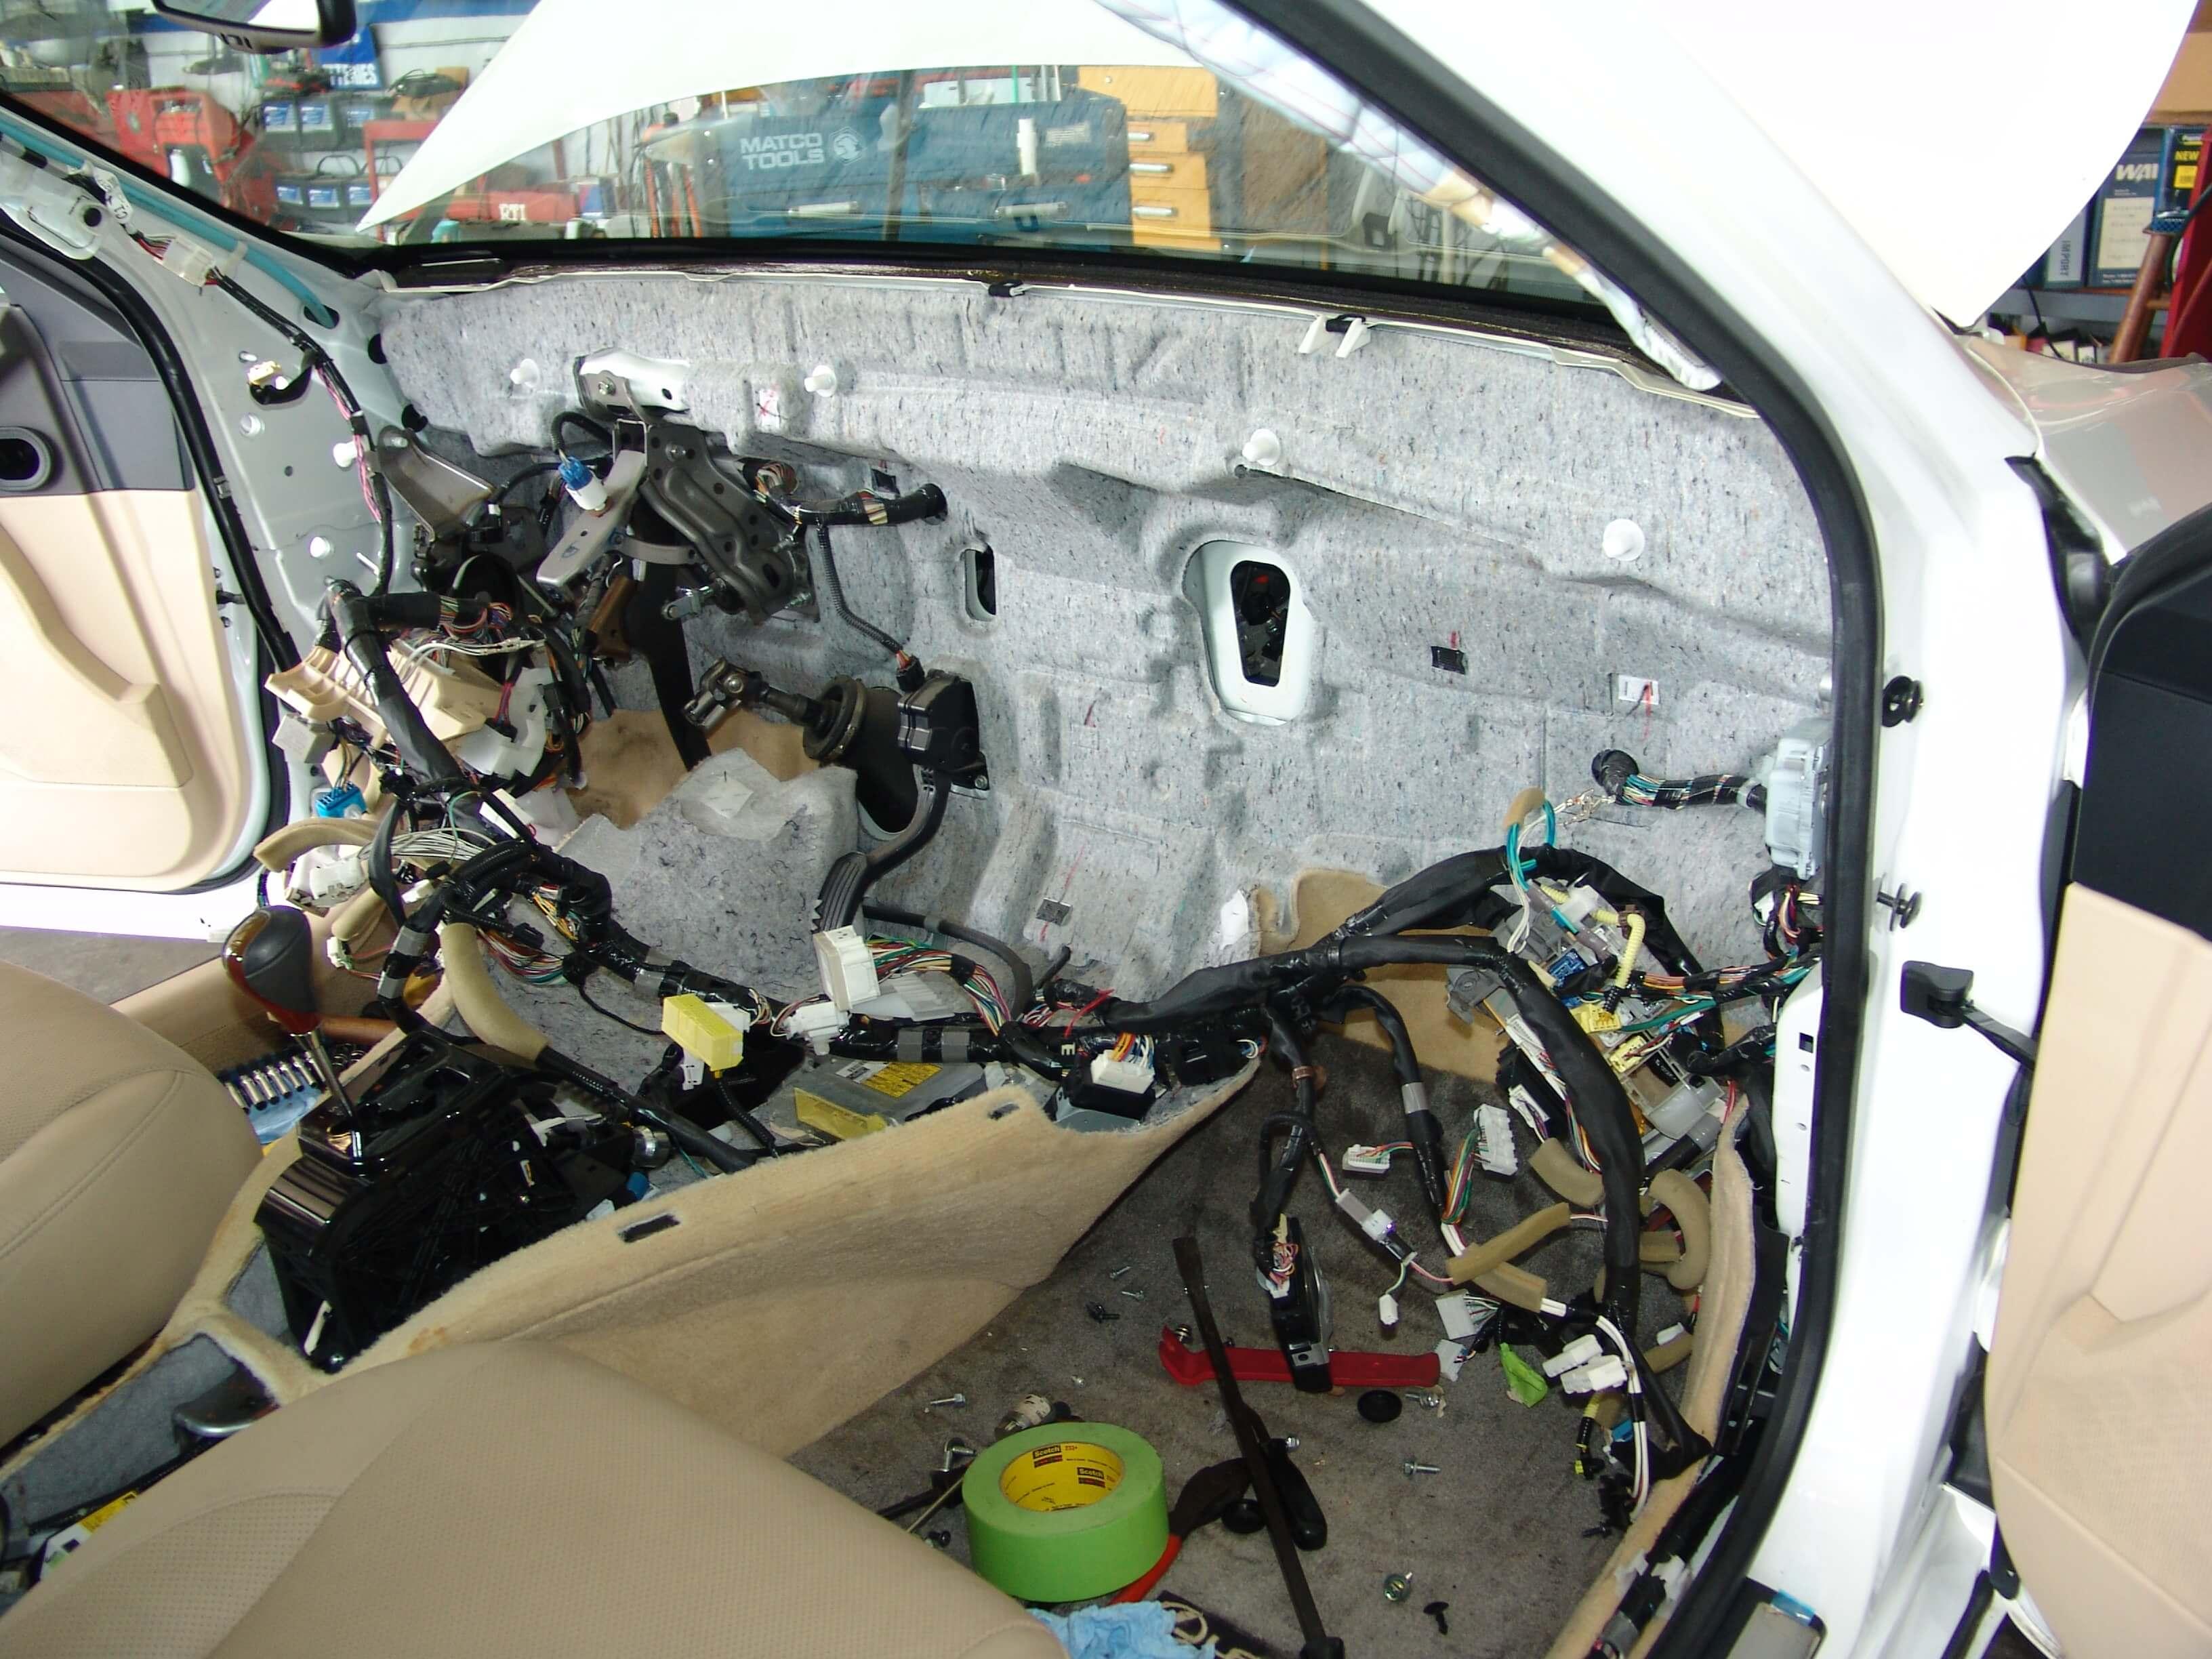 2011 Chevy Equinox Fuse Box Diagram Sparky S Answers 2009 Lexus Es350 Evaporator Core